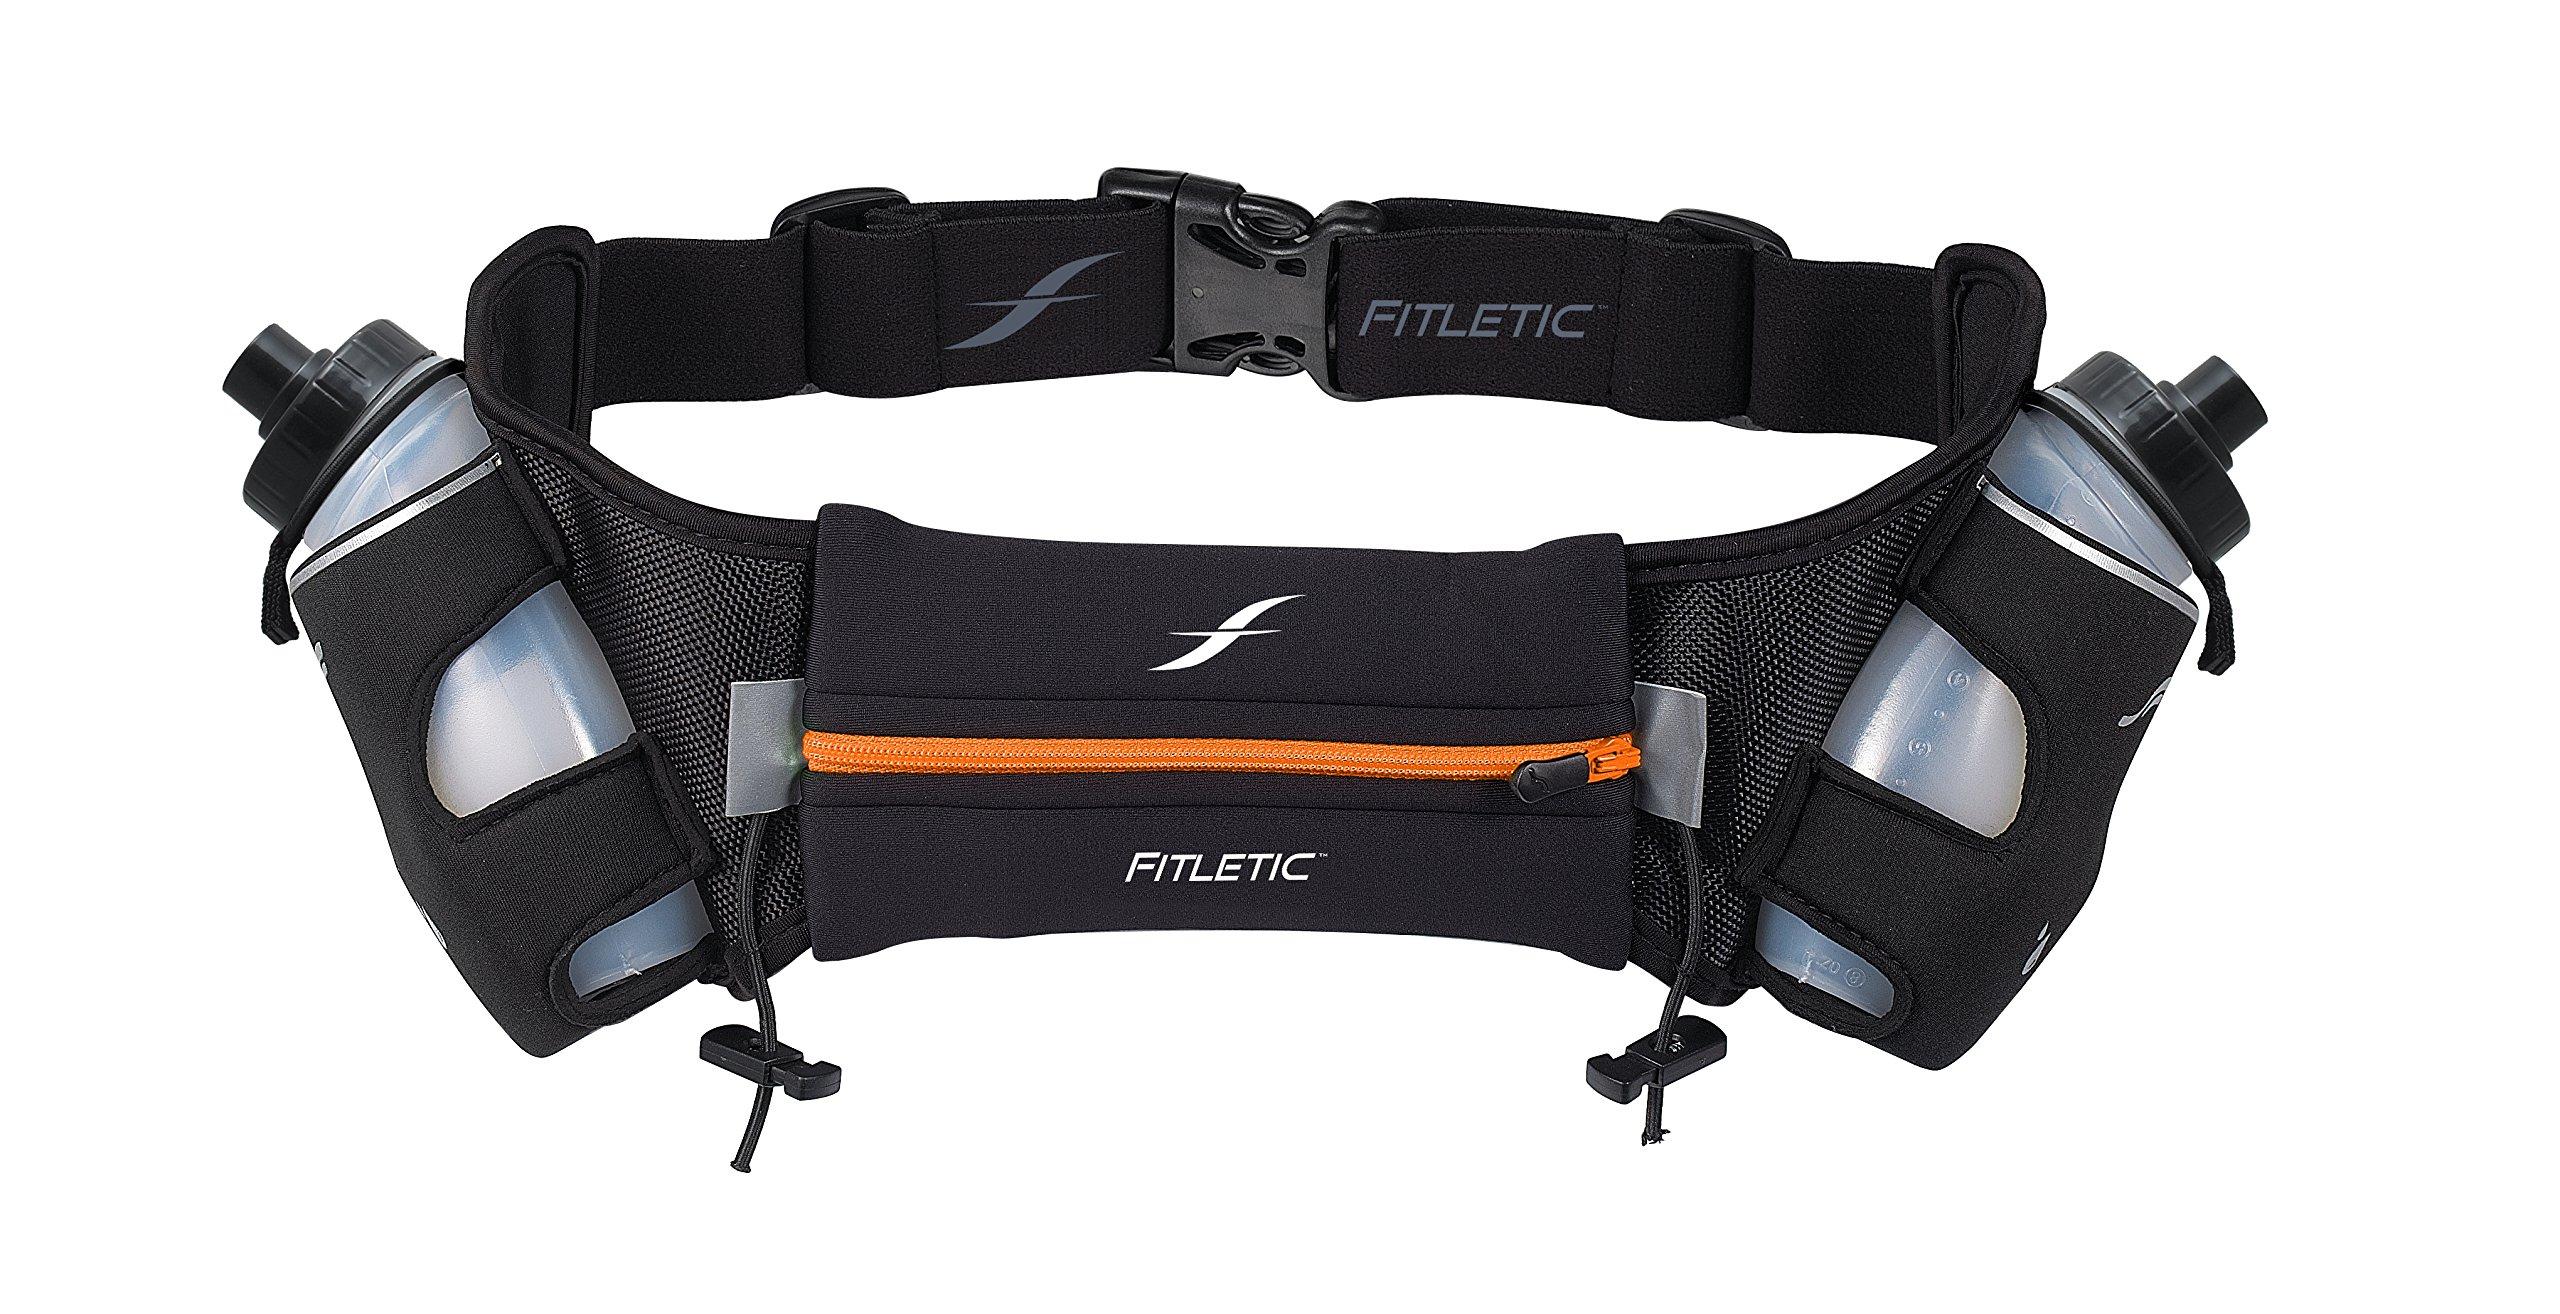 Fitletic  12 Oz Hydration Belt, Black/Orange, Small/Medium